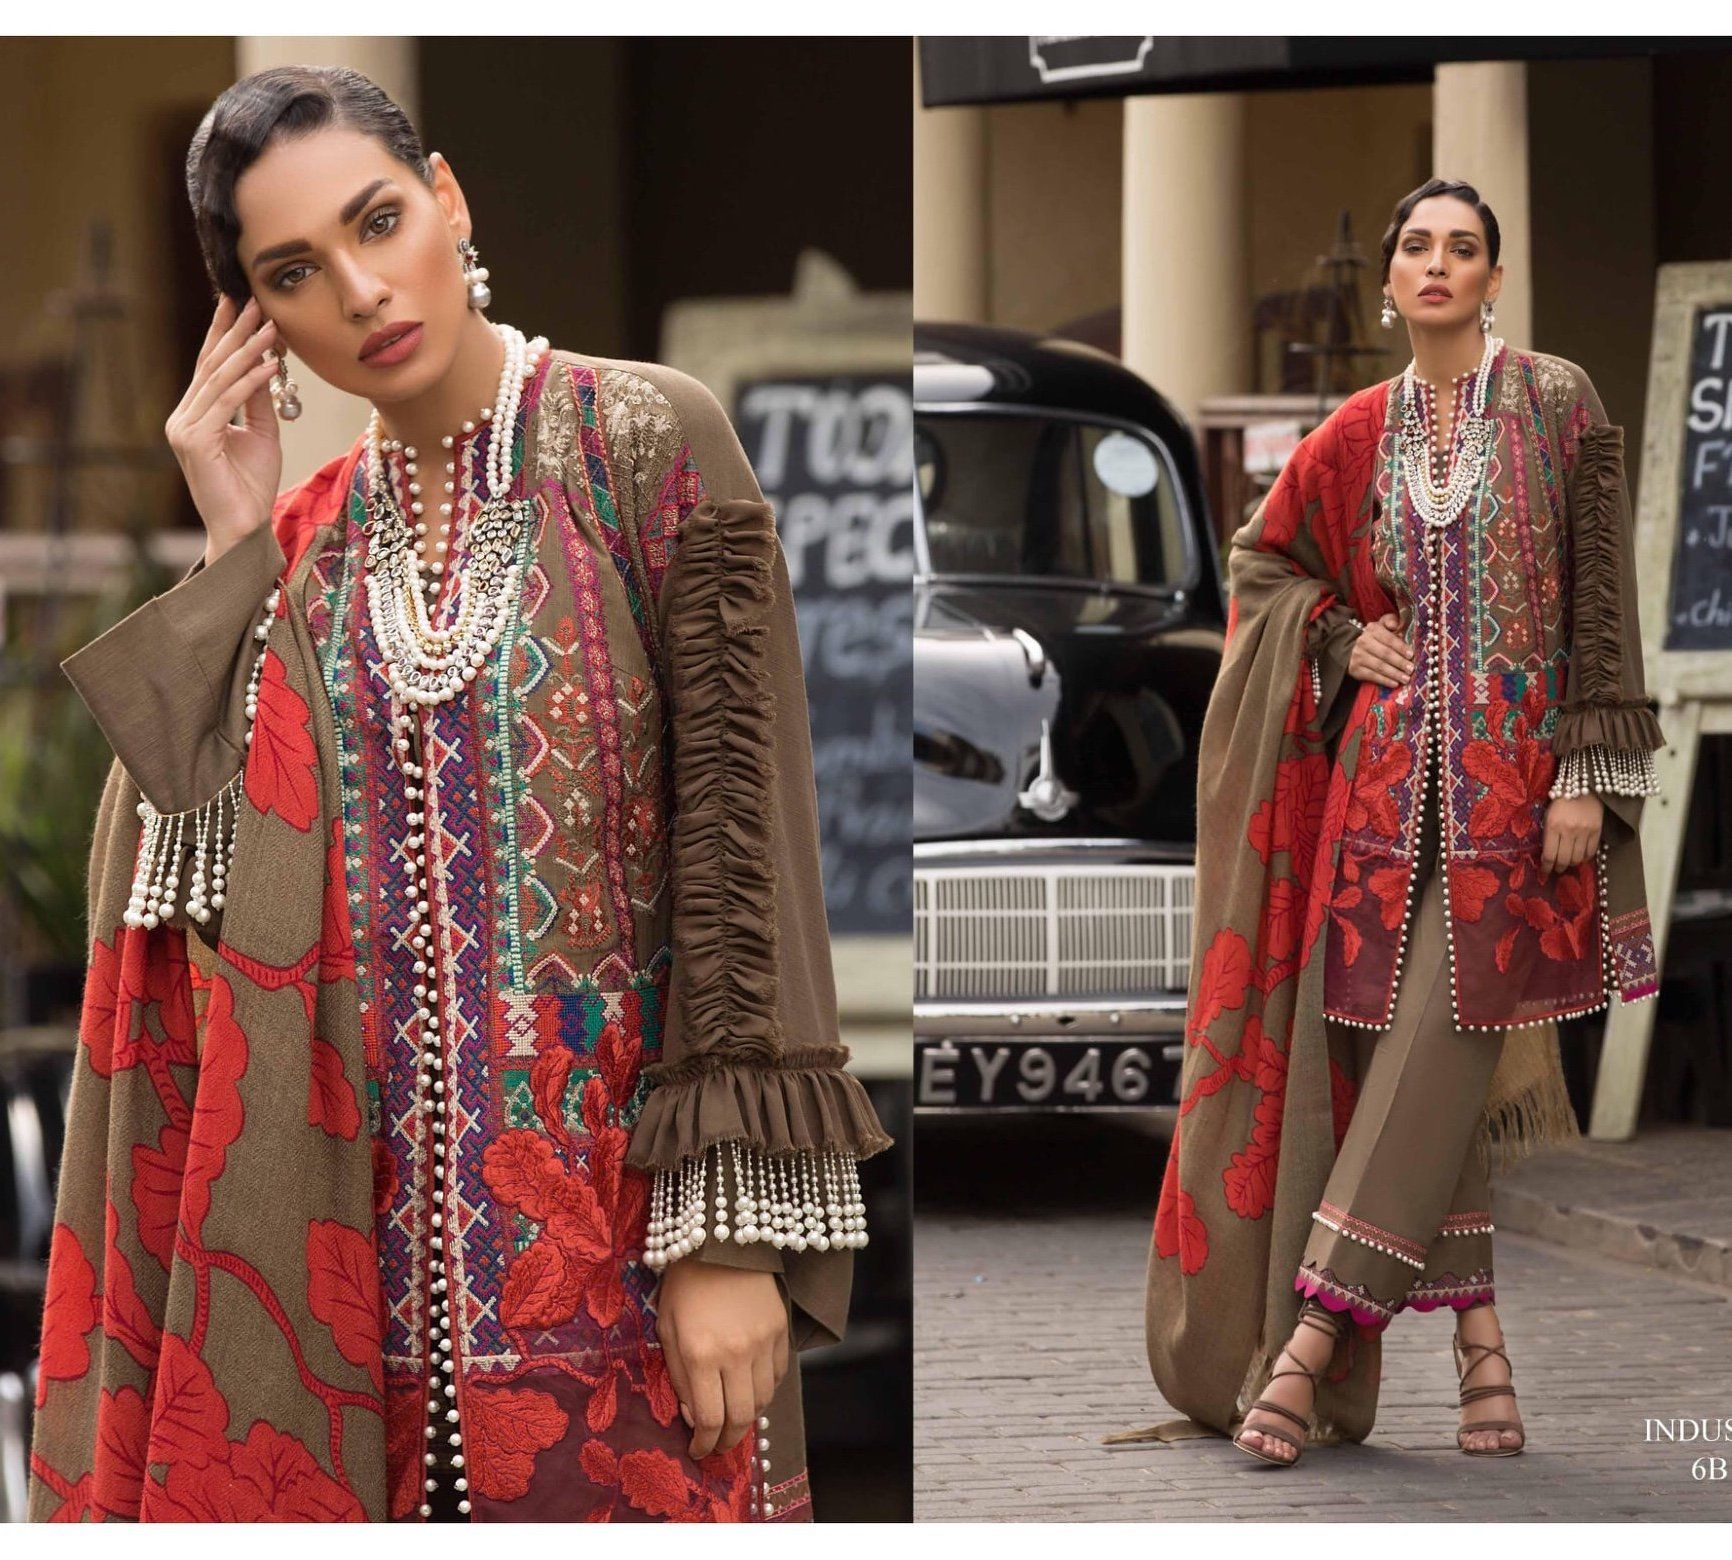 Top Pakistani Designer Dress By Sana Safinaz Model W 1650 Beautiful Pakistani Dresses Designer Dresses Online Pakistani Dress Design